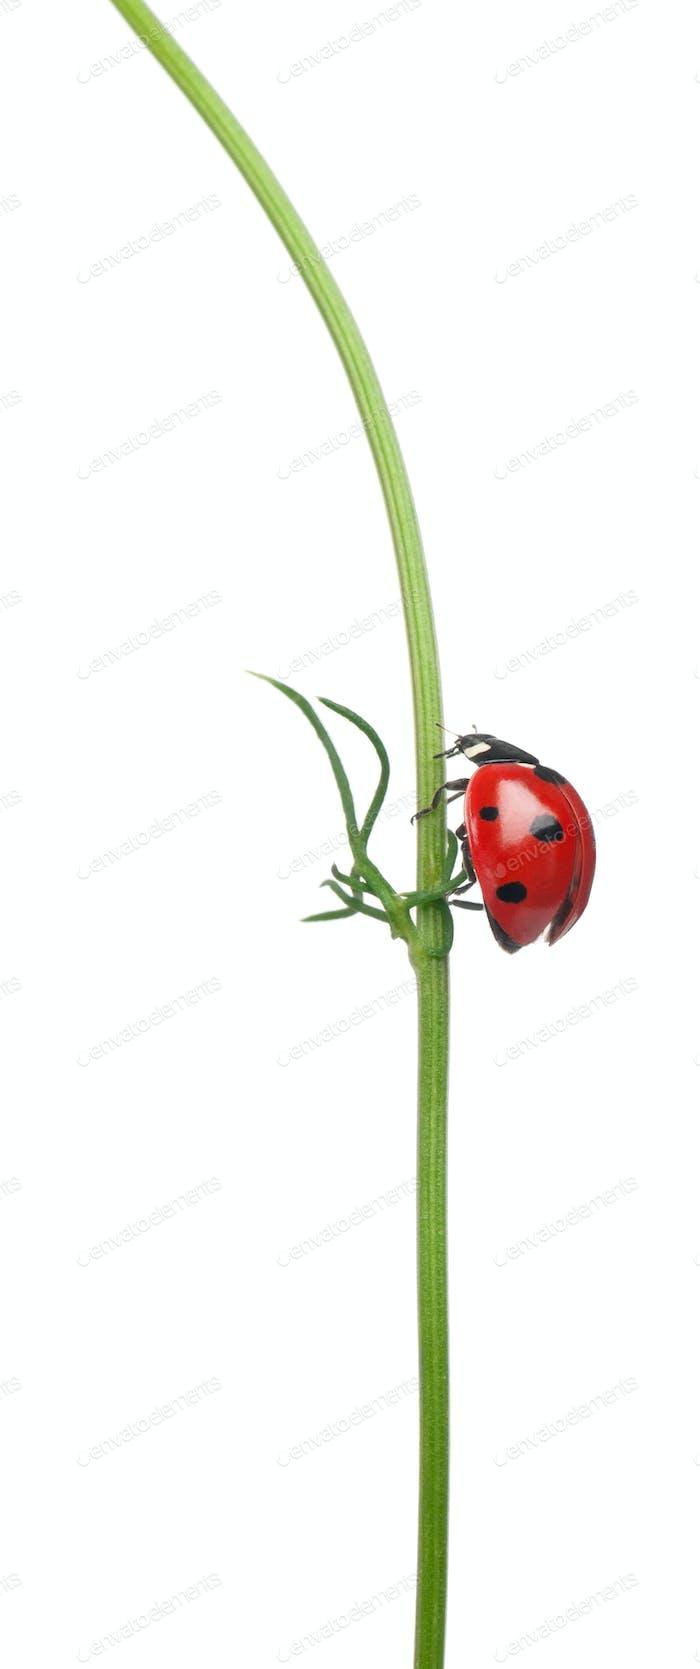 Seven-spot ladybird or seven-spot ladybug on a daisy, Coccinella septempunctata